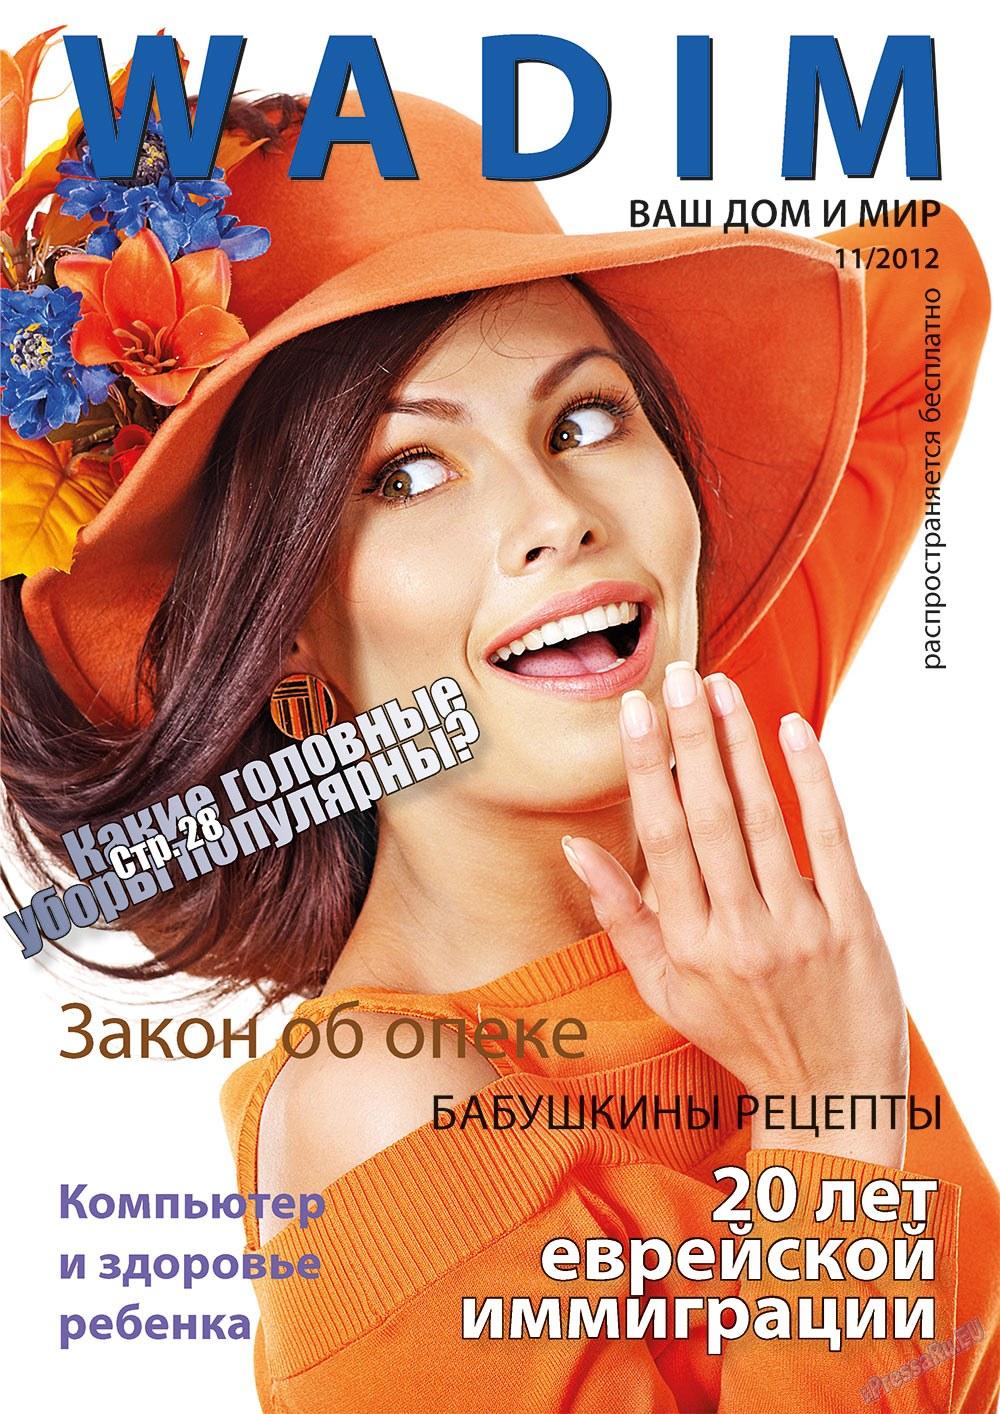 Wadim (журнал). 2012 год, номер 11, стр. 1